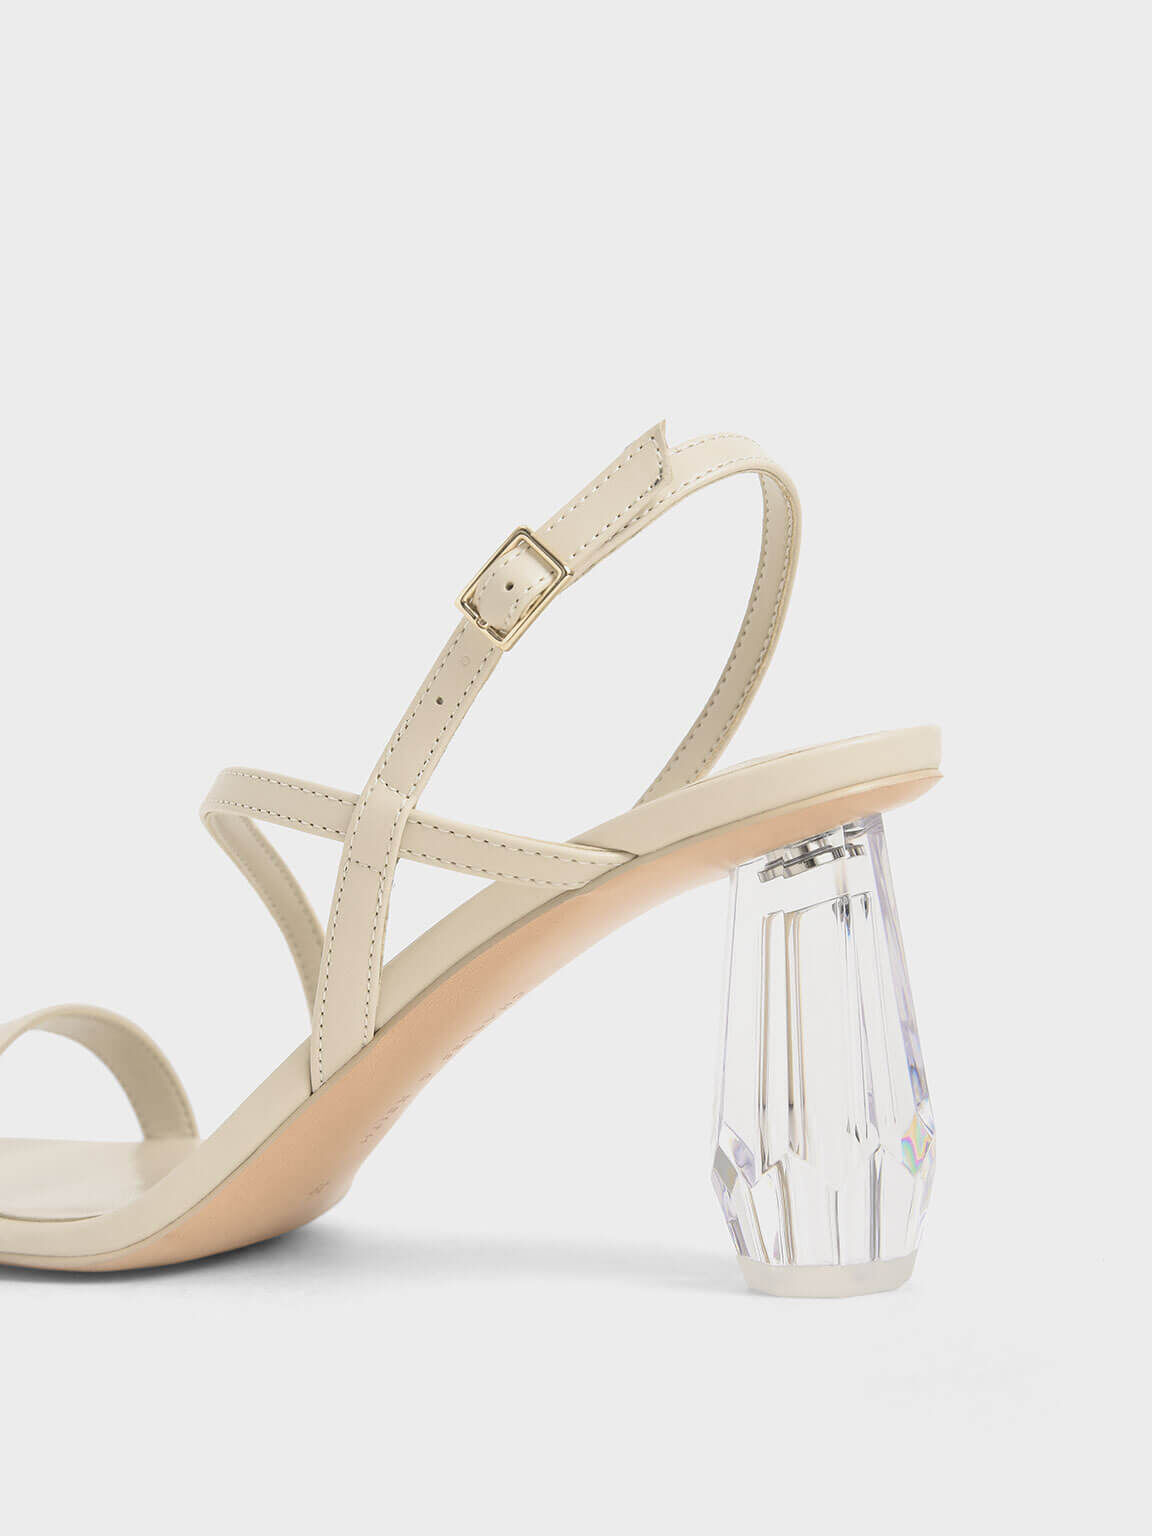 See-Through Sculptural Heel Sandals, Chalk, hi-res